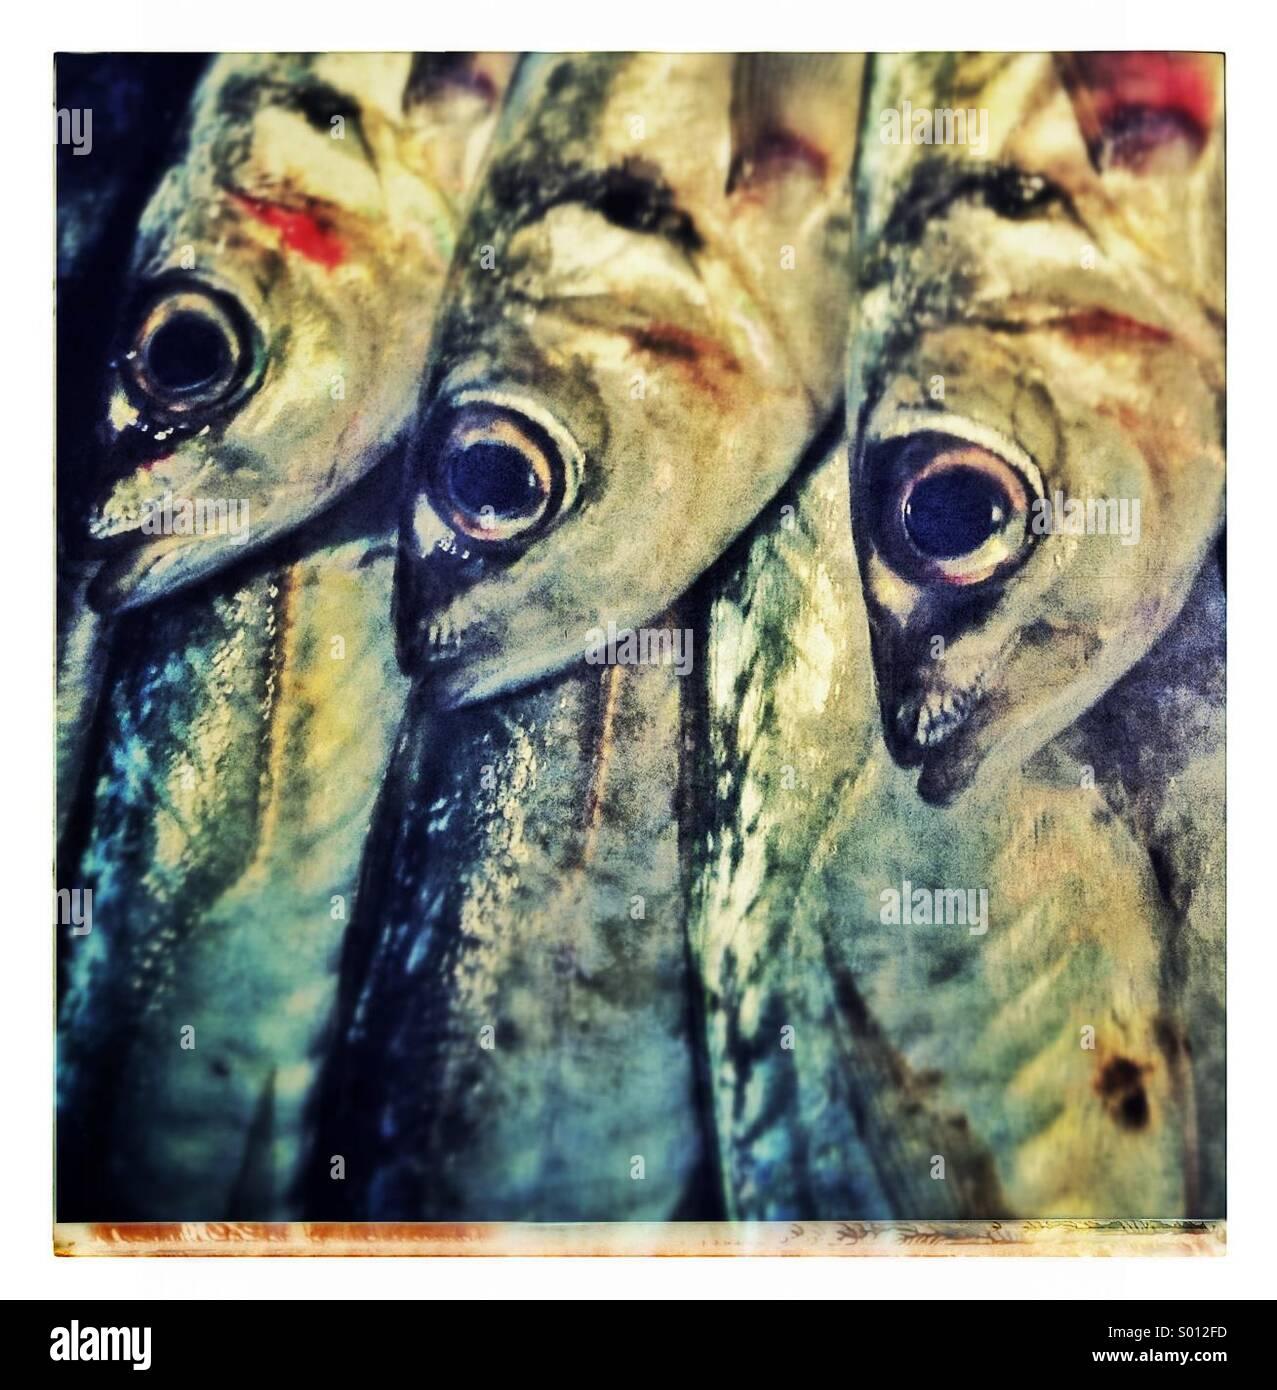 Sardines fishes close up - Stock Image